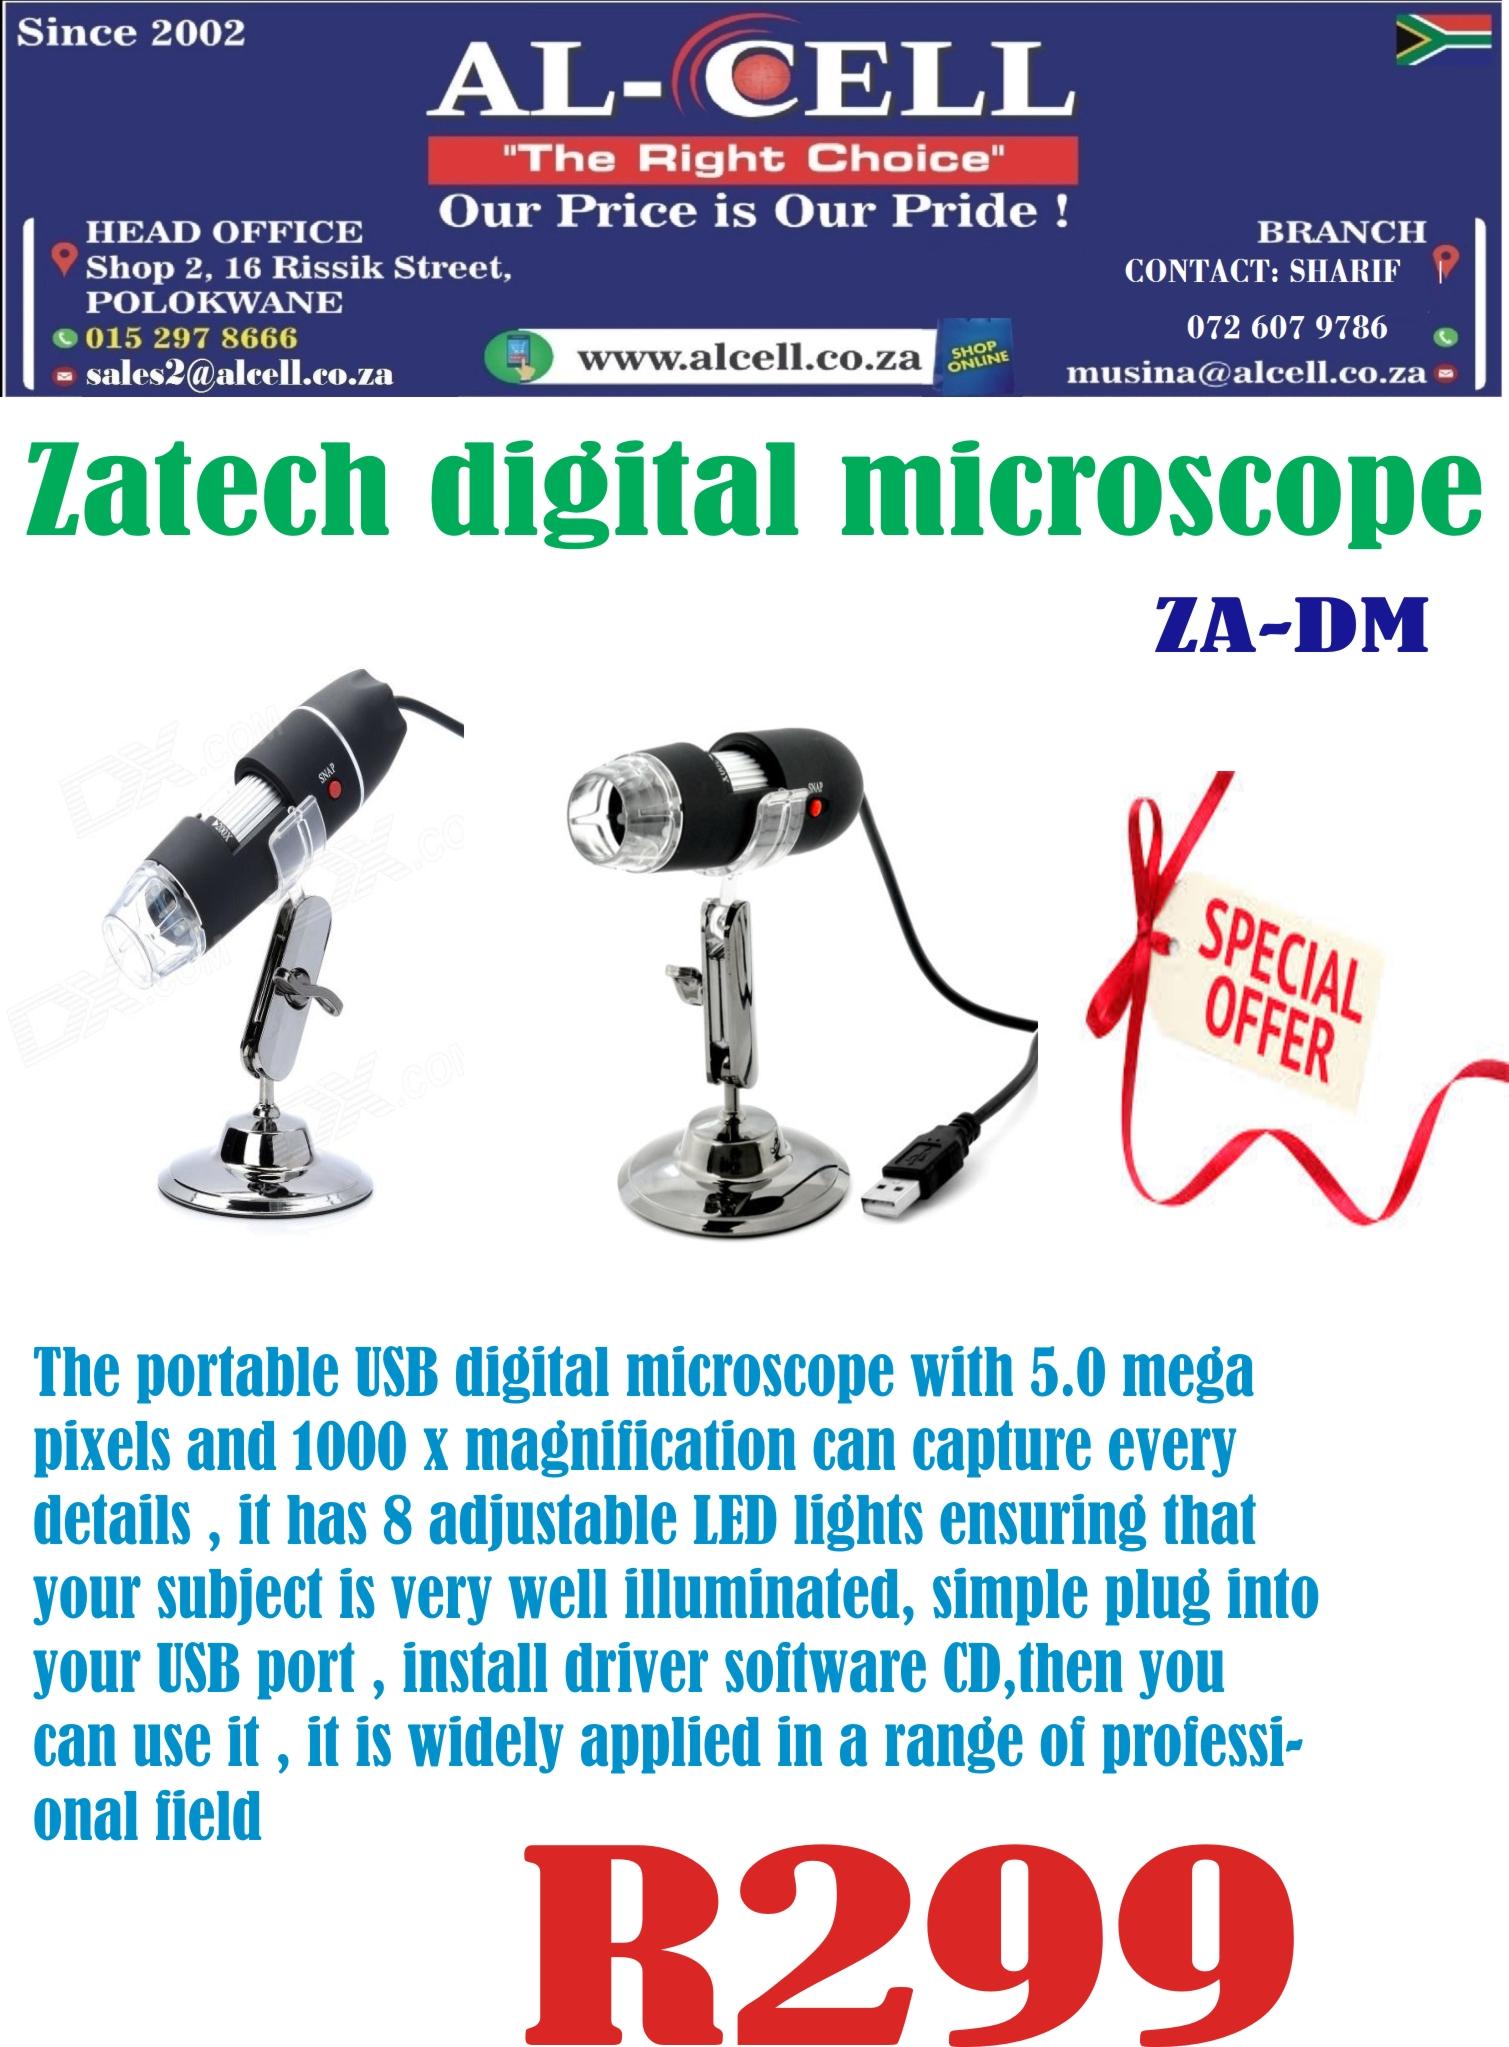 ZATECH DIGITAL MICROSCOPE